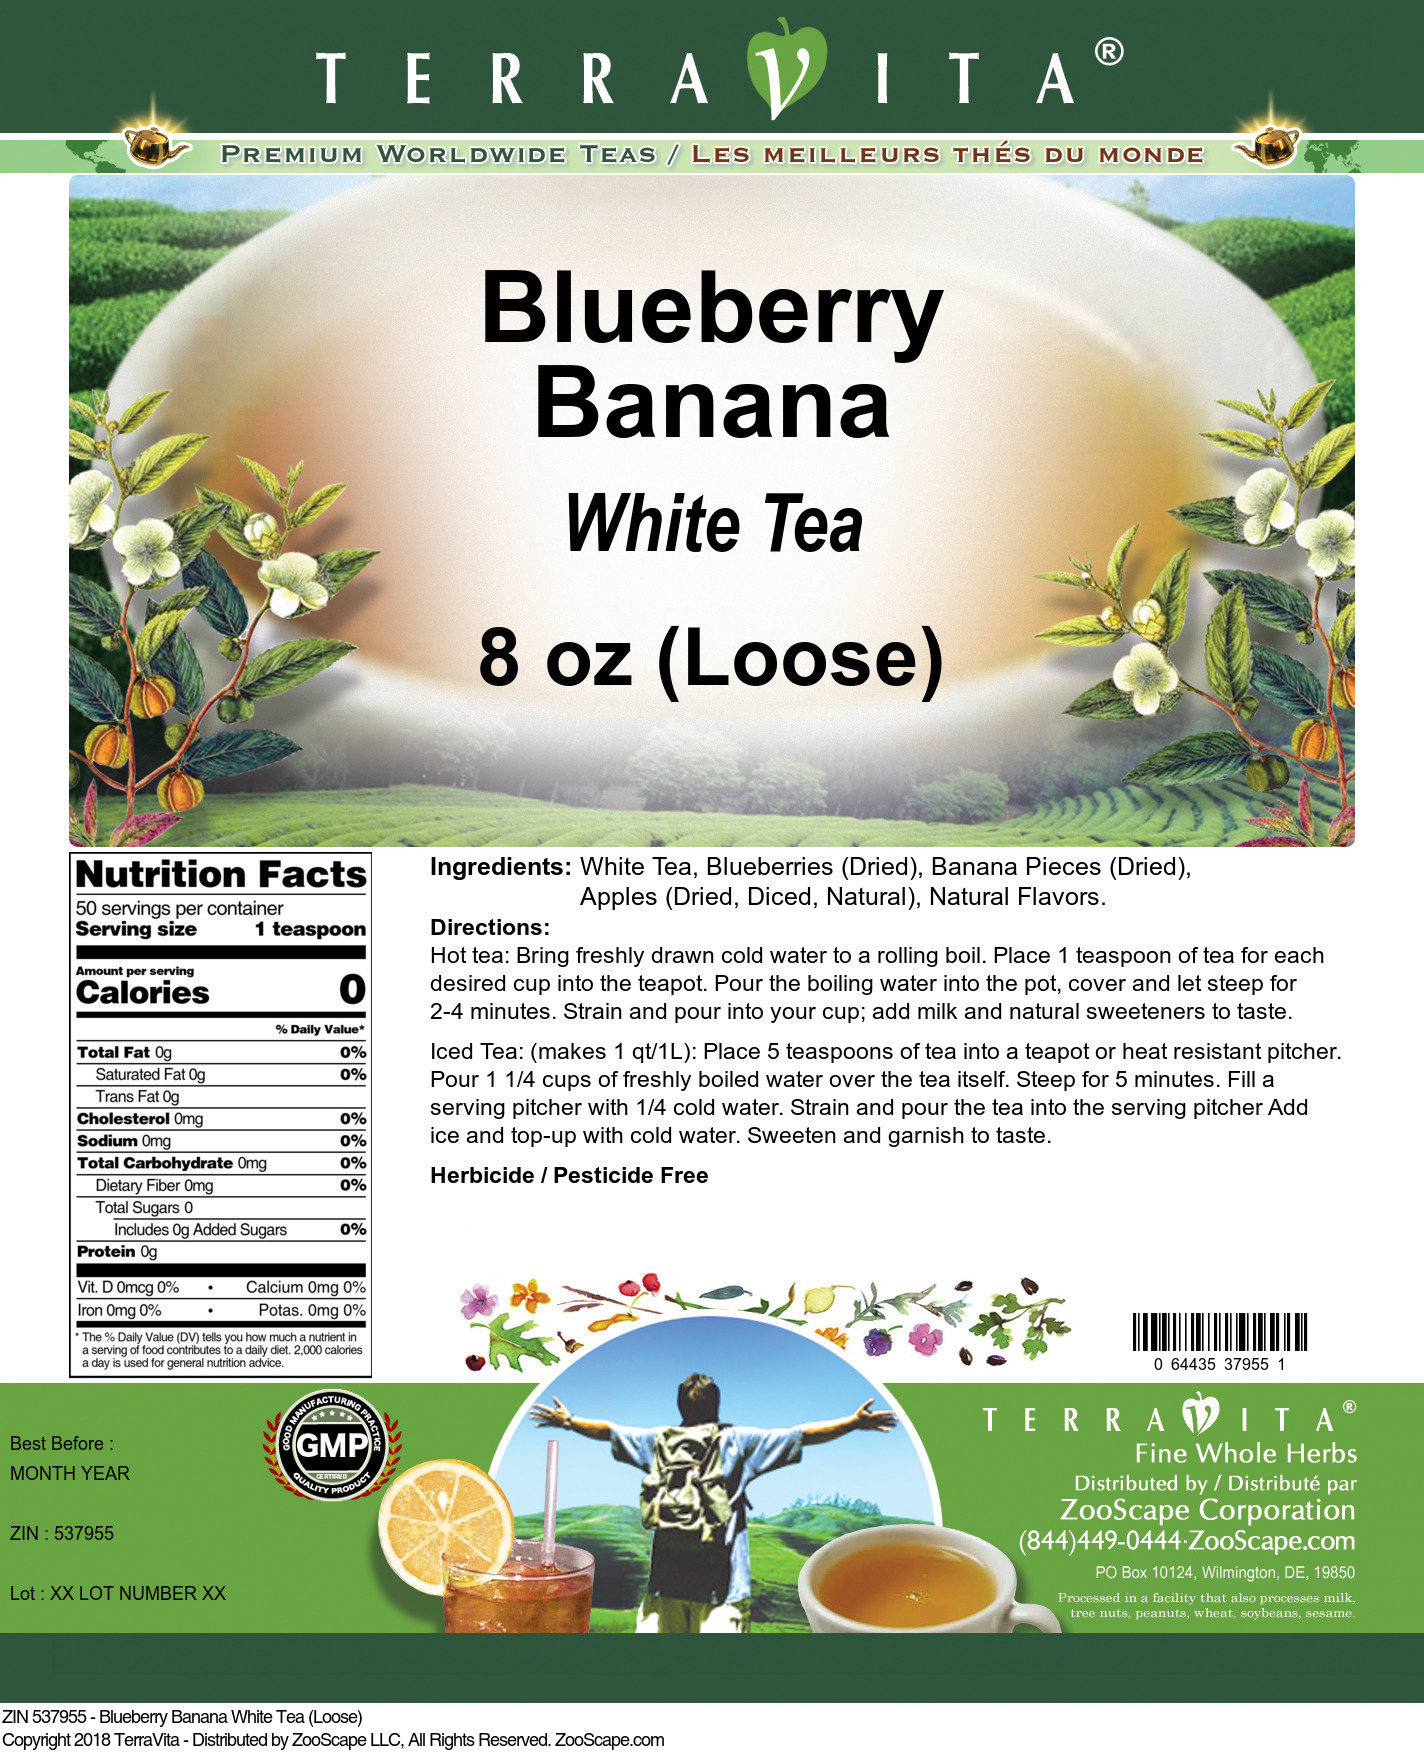 Blueberry Banana White Tea (Loose)